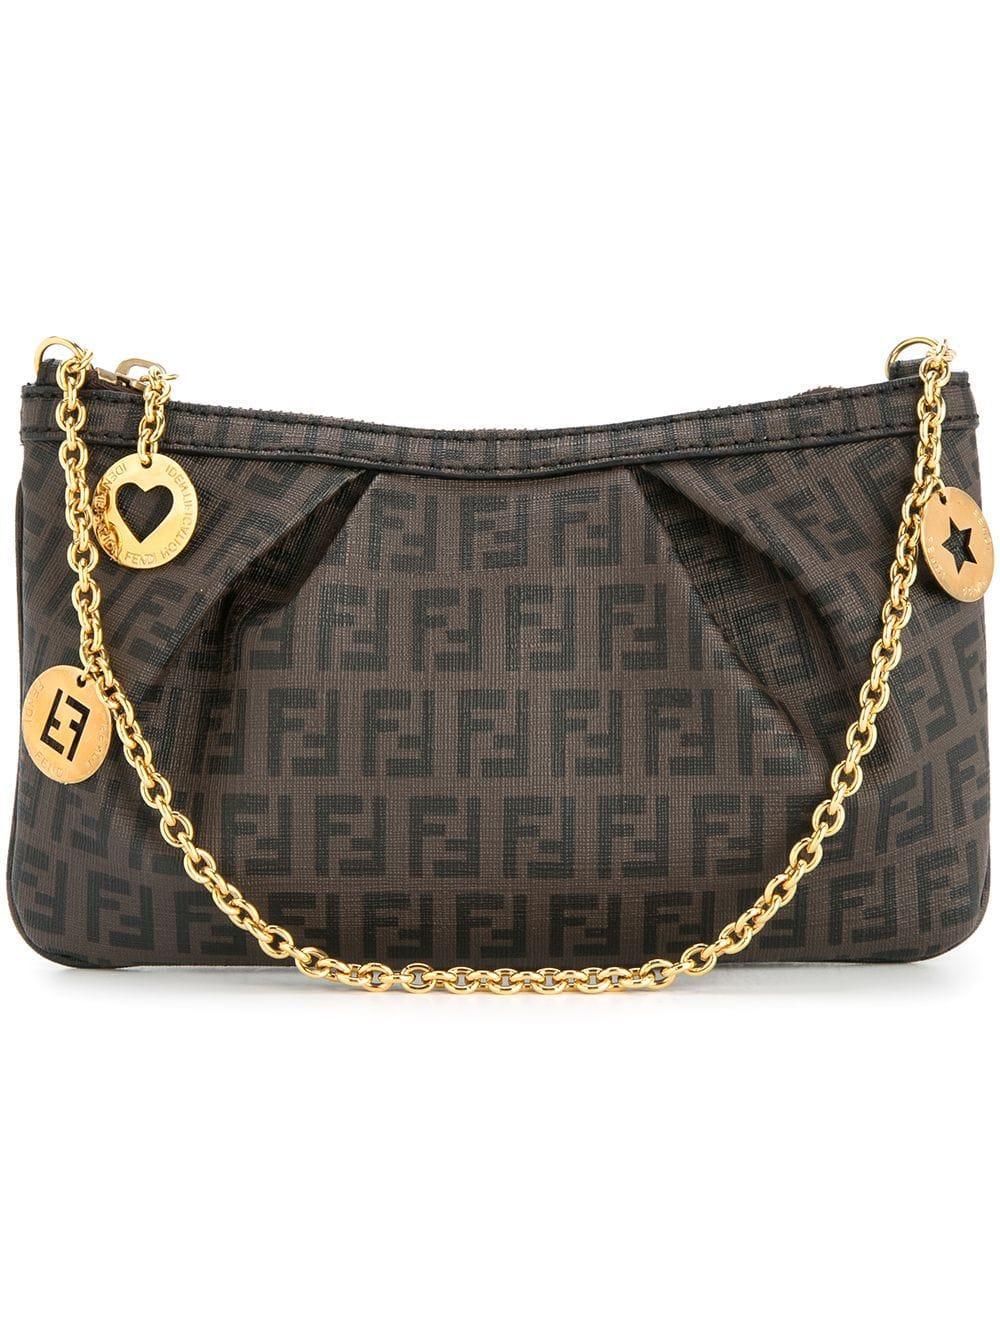 4f58d7e230c Fendi Zucca Pattern Identification Chain Hand Bag In Brown | ModeSens